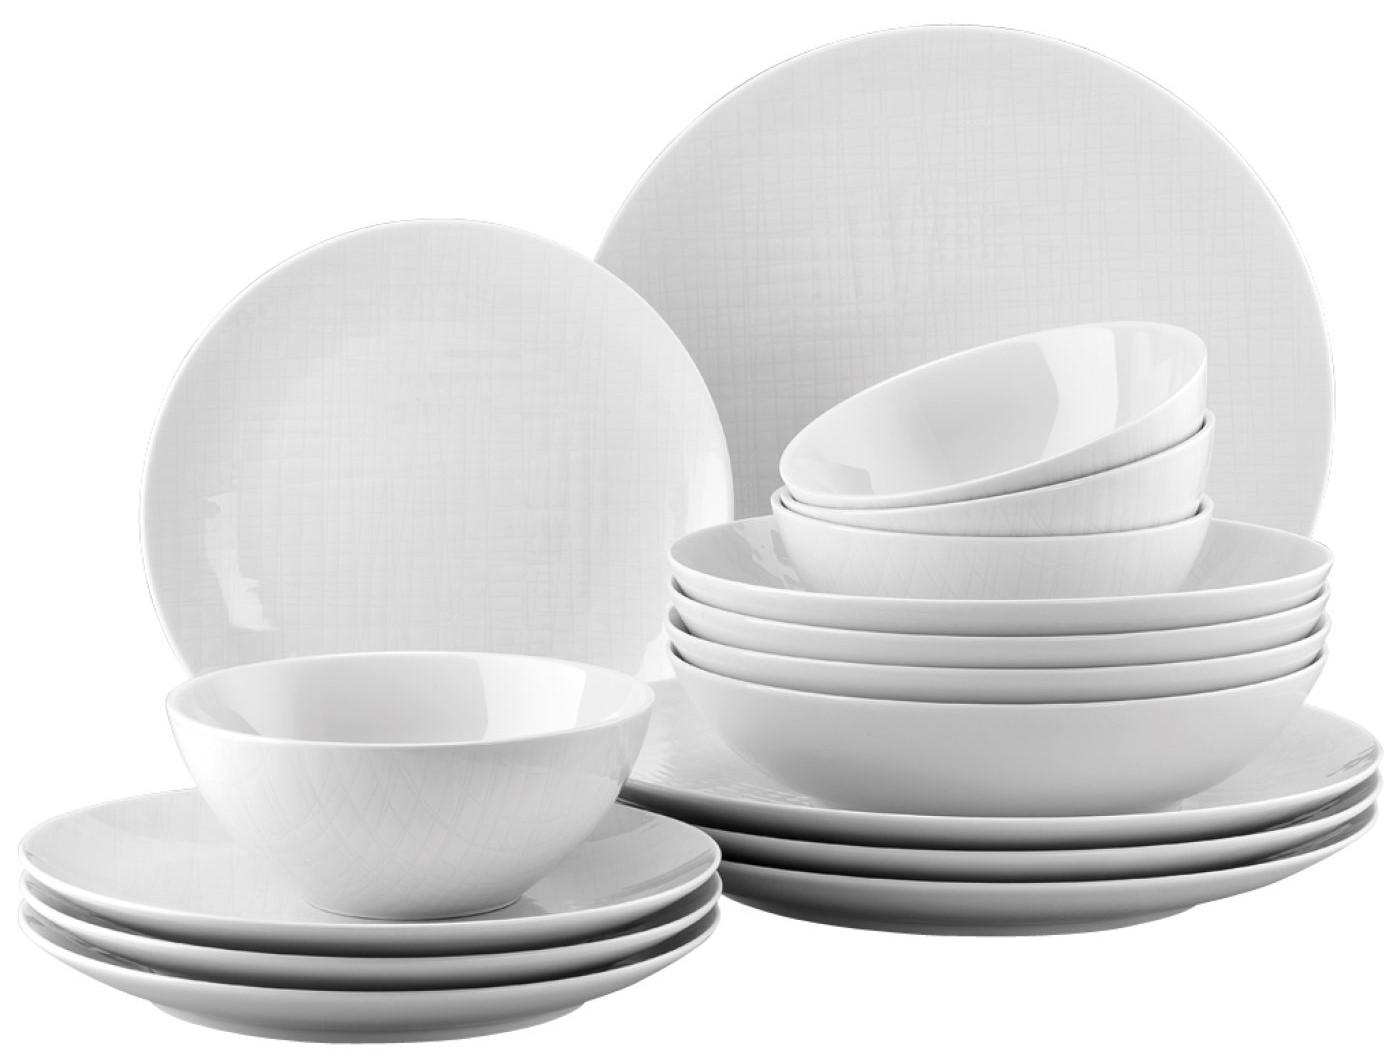 Rosenthal Mesh Hvit 16 deler Middagsservice med Frokostskåler